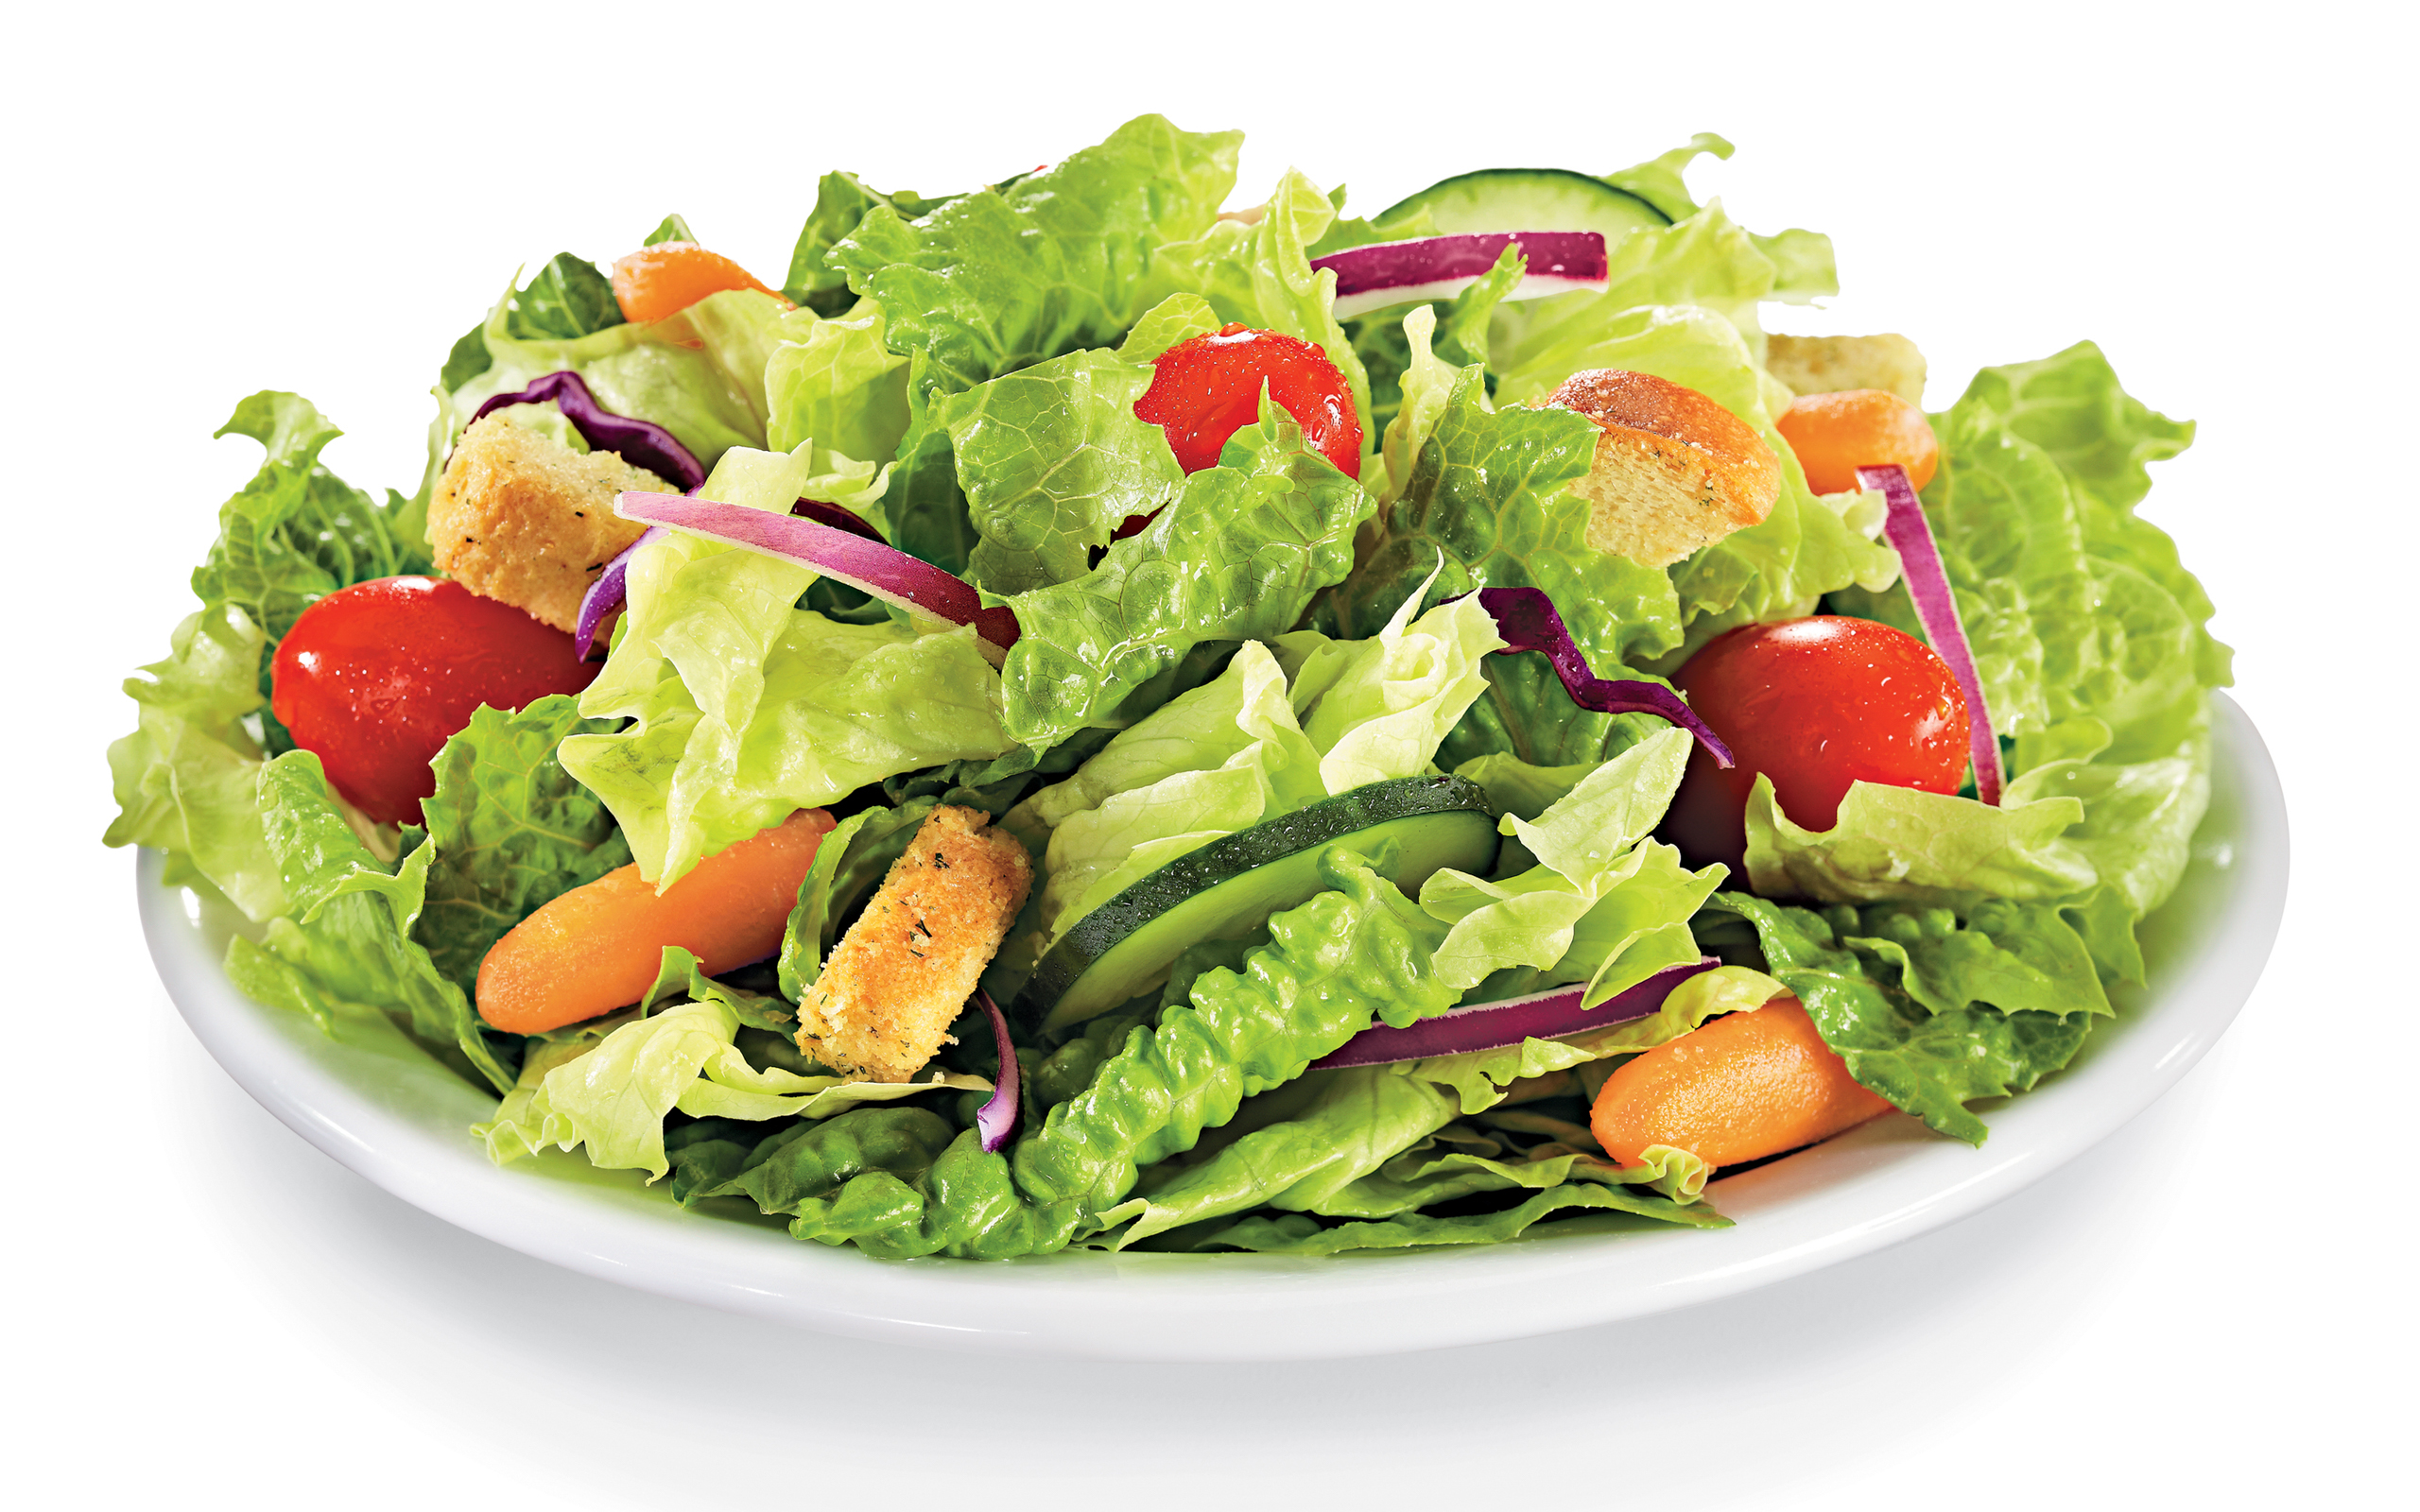 картинка салата из овощей